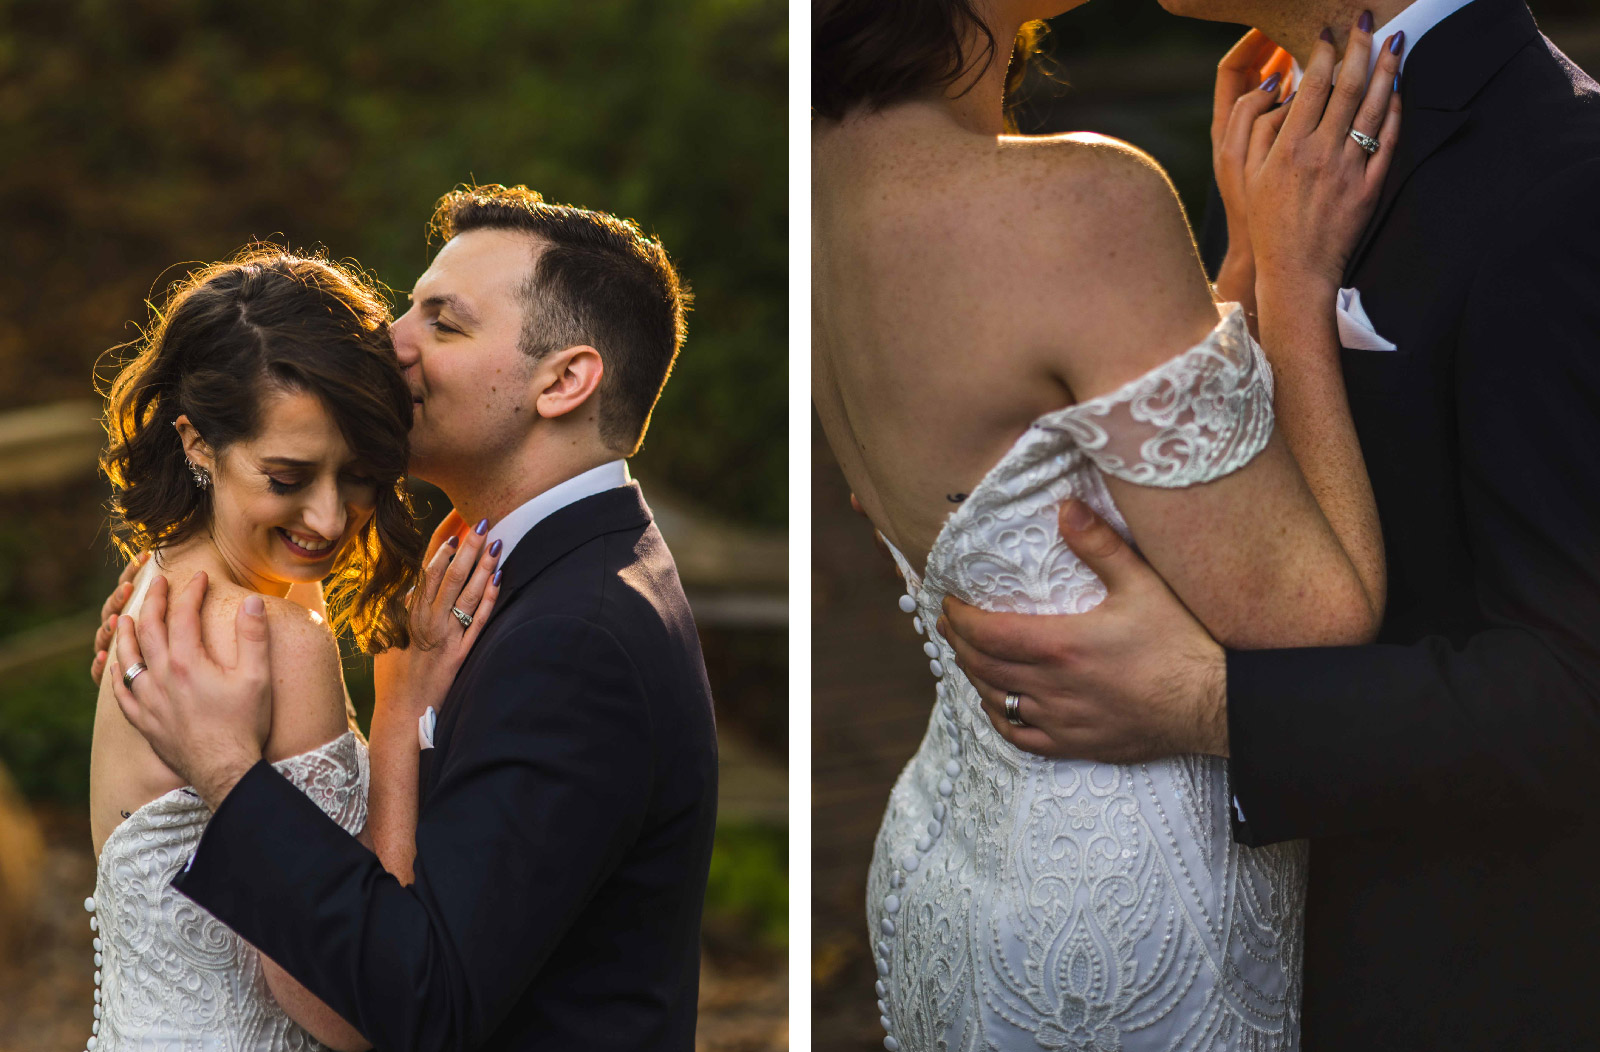 Mike & Allison Snuggle Hush Hush Photography & Film Aidan Hennebry Hamilton Wedding Photographer Videographer-01.jpg